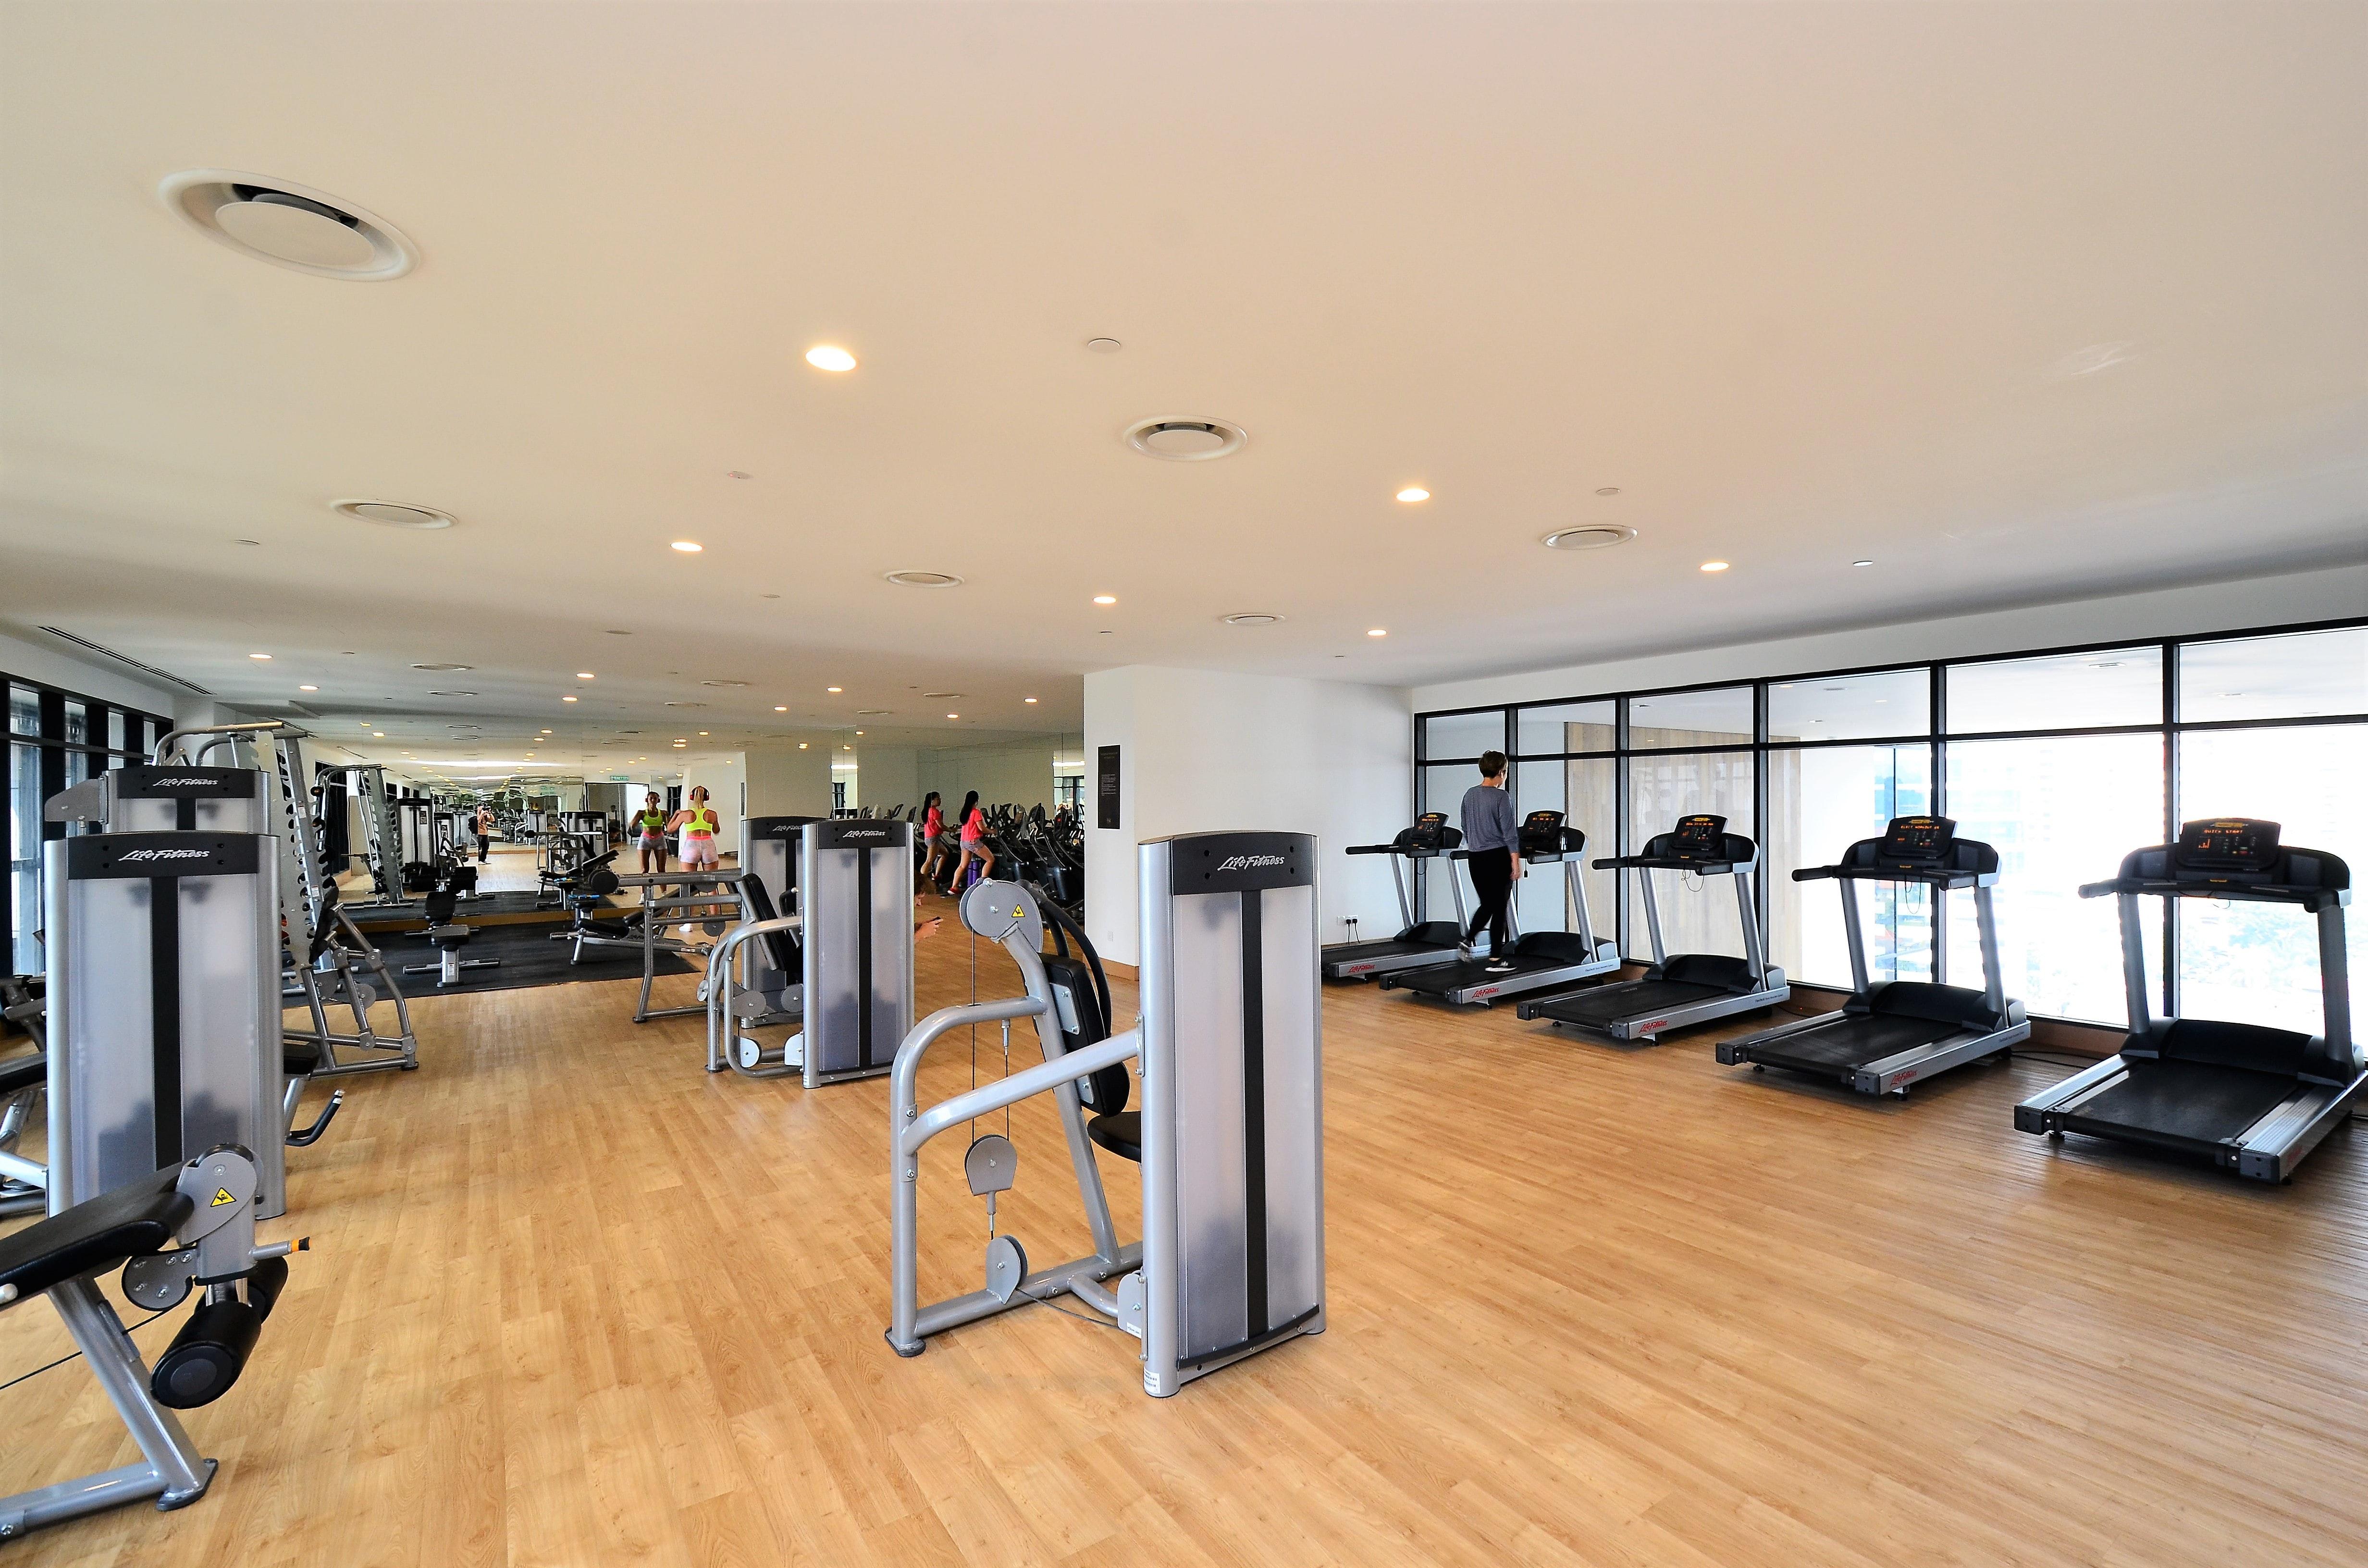 Cheap Gym Membership & Fitness